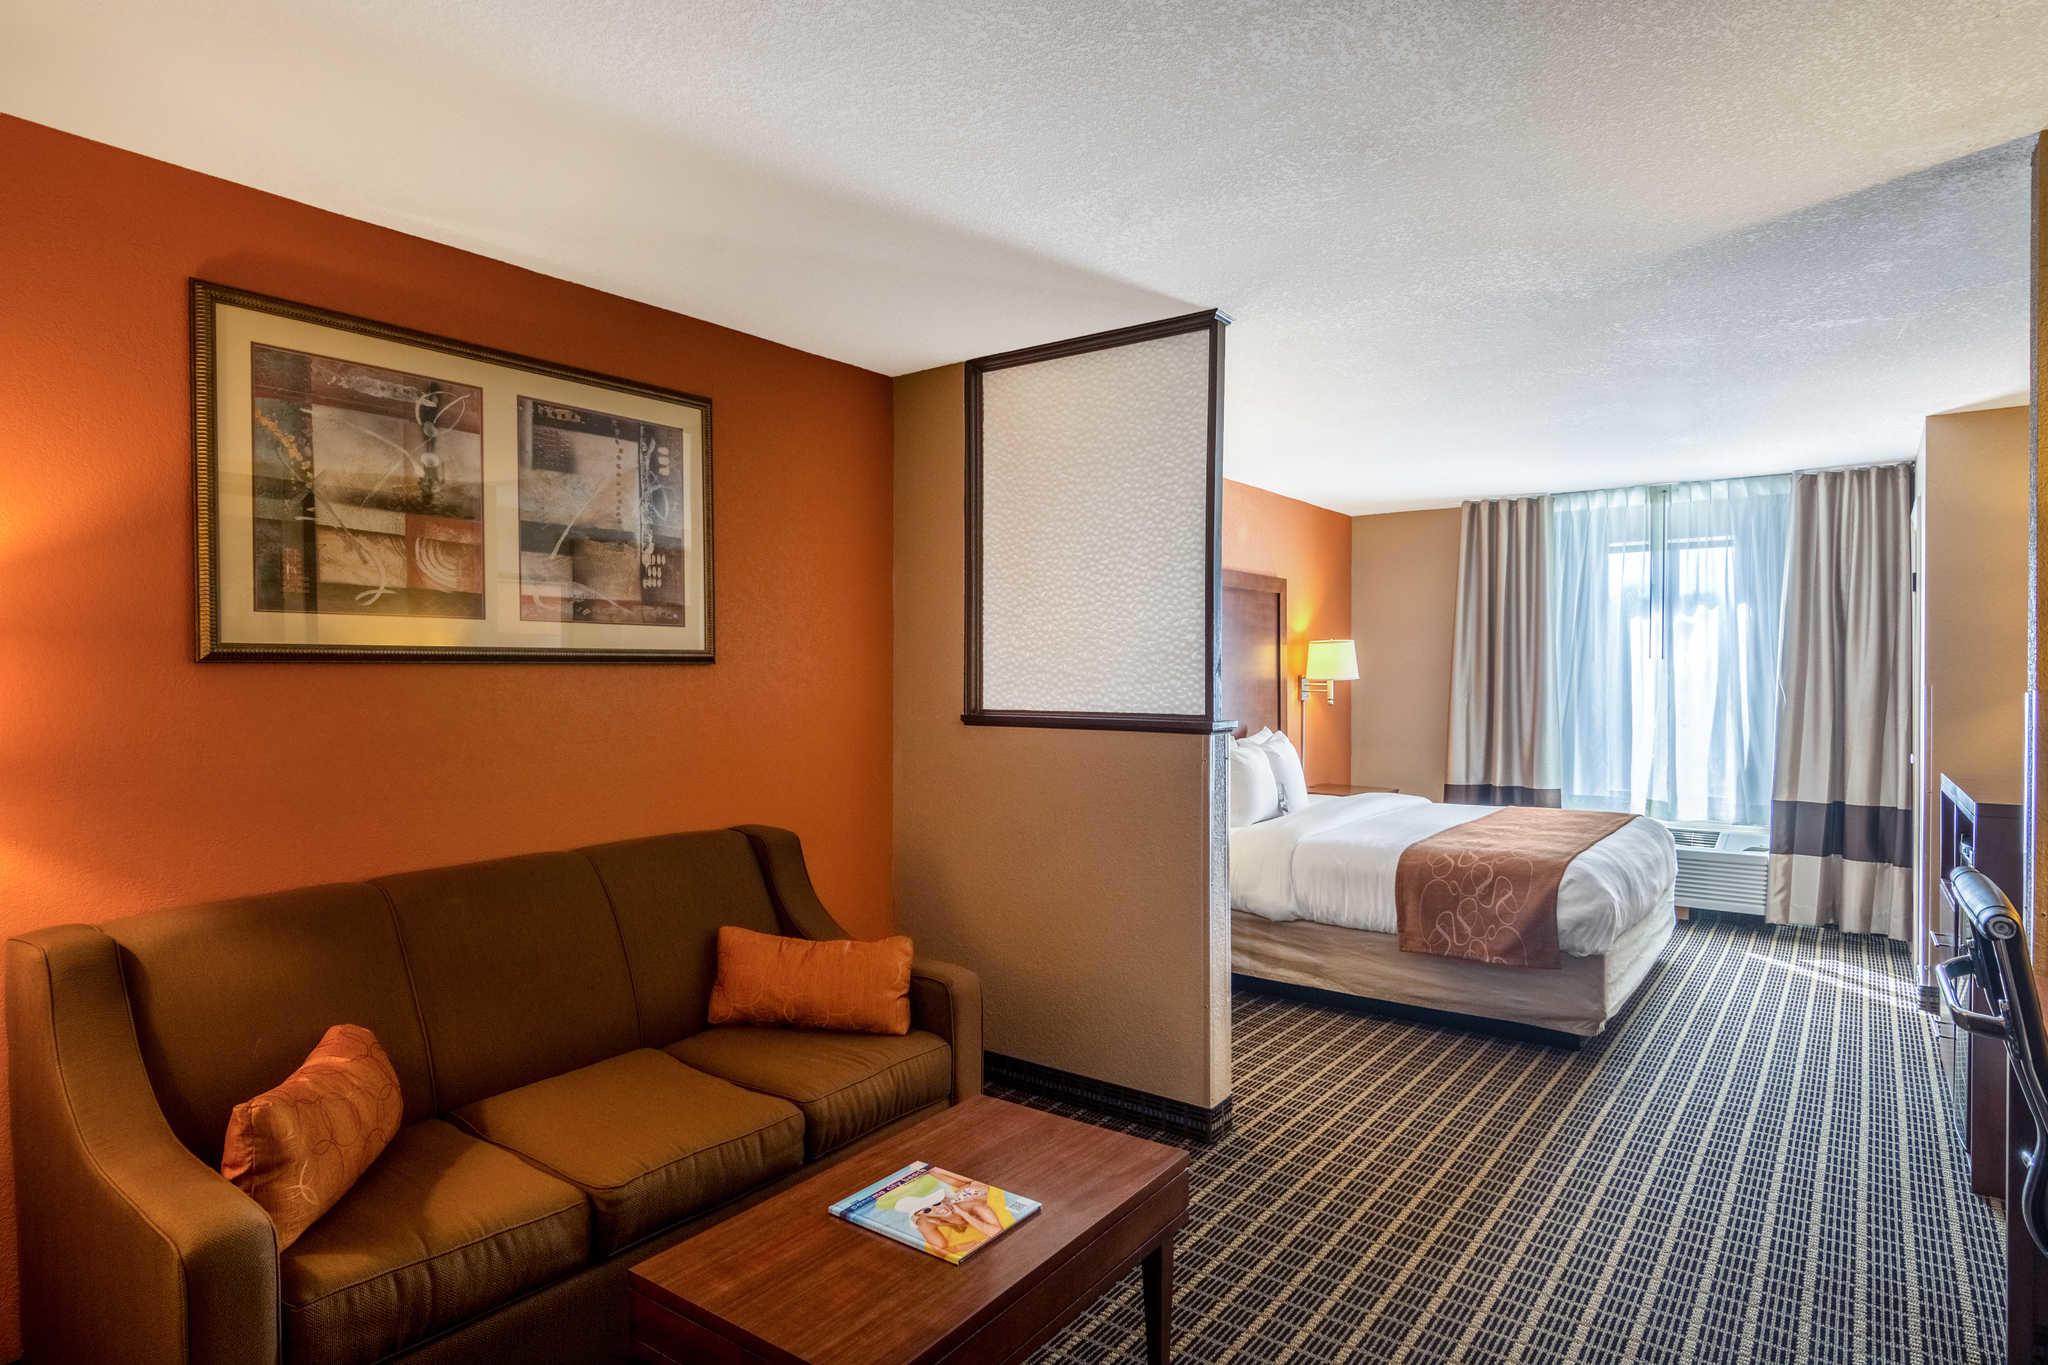 Comfort Suites image 33